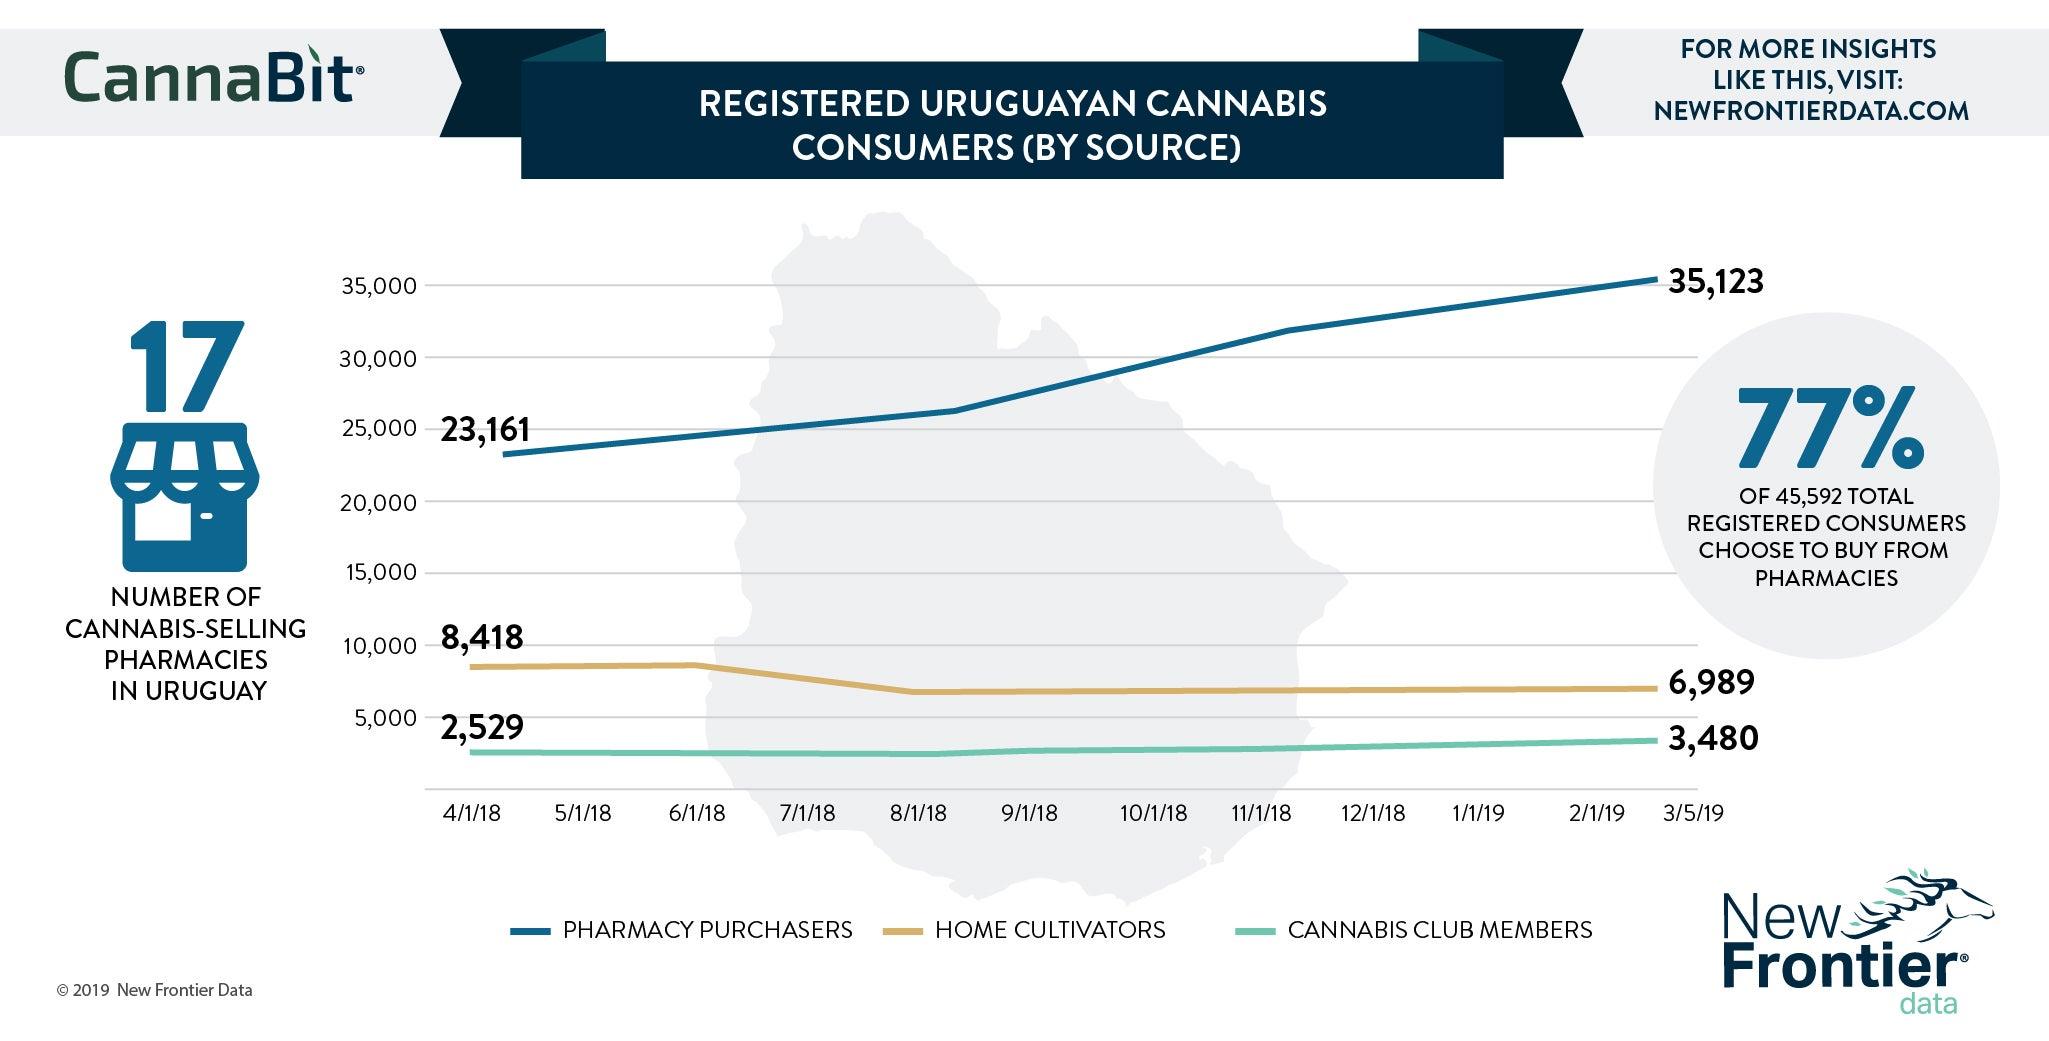 3-22-2019-cannabit-infographic.jpg